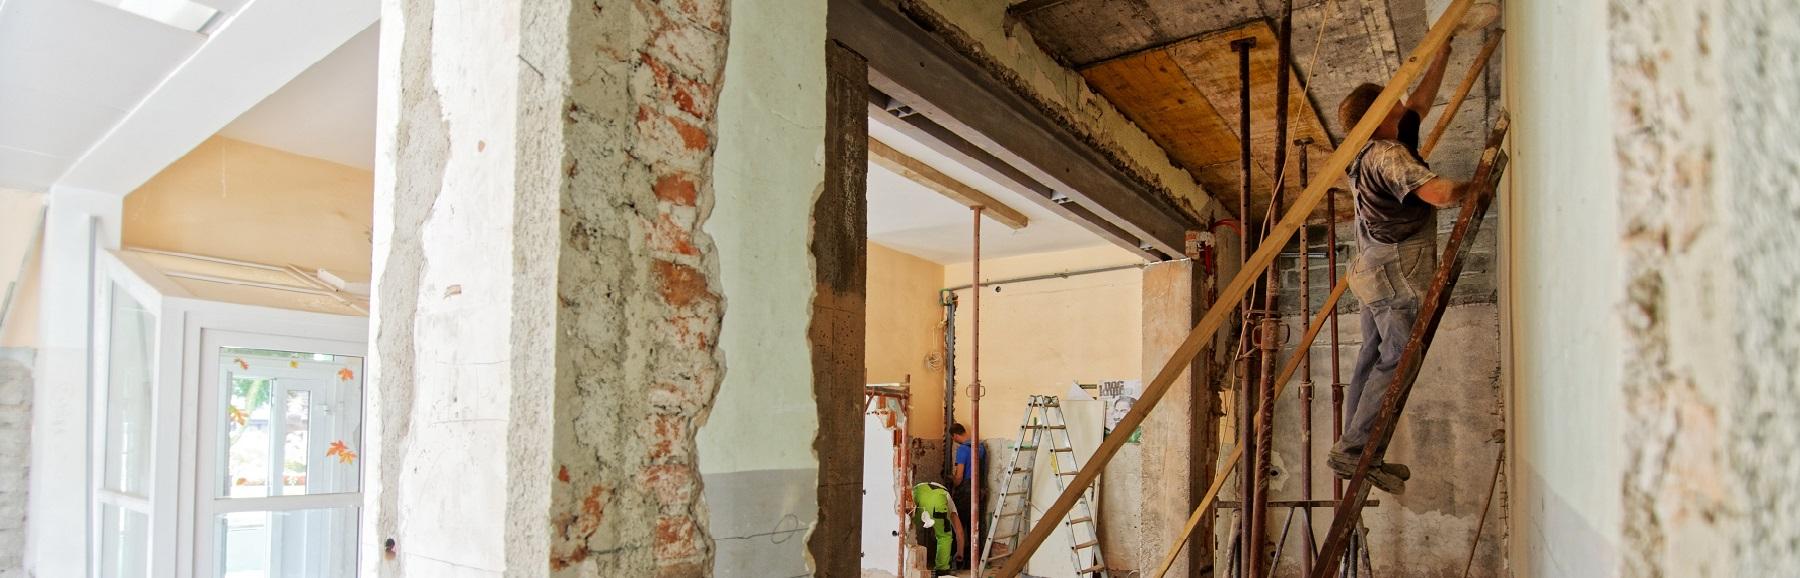 Apex Basement Finishing Amp Remodeling Home Remodeling